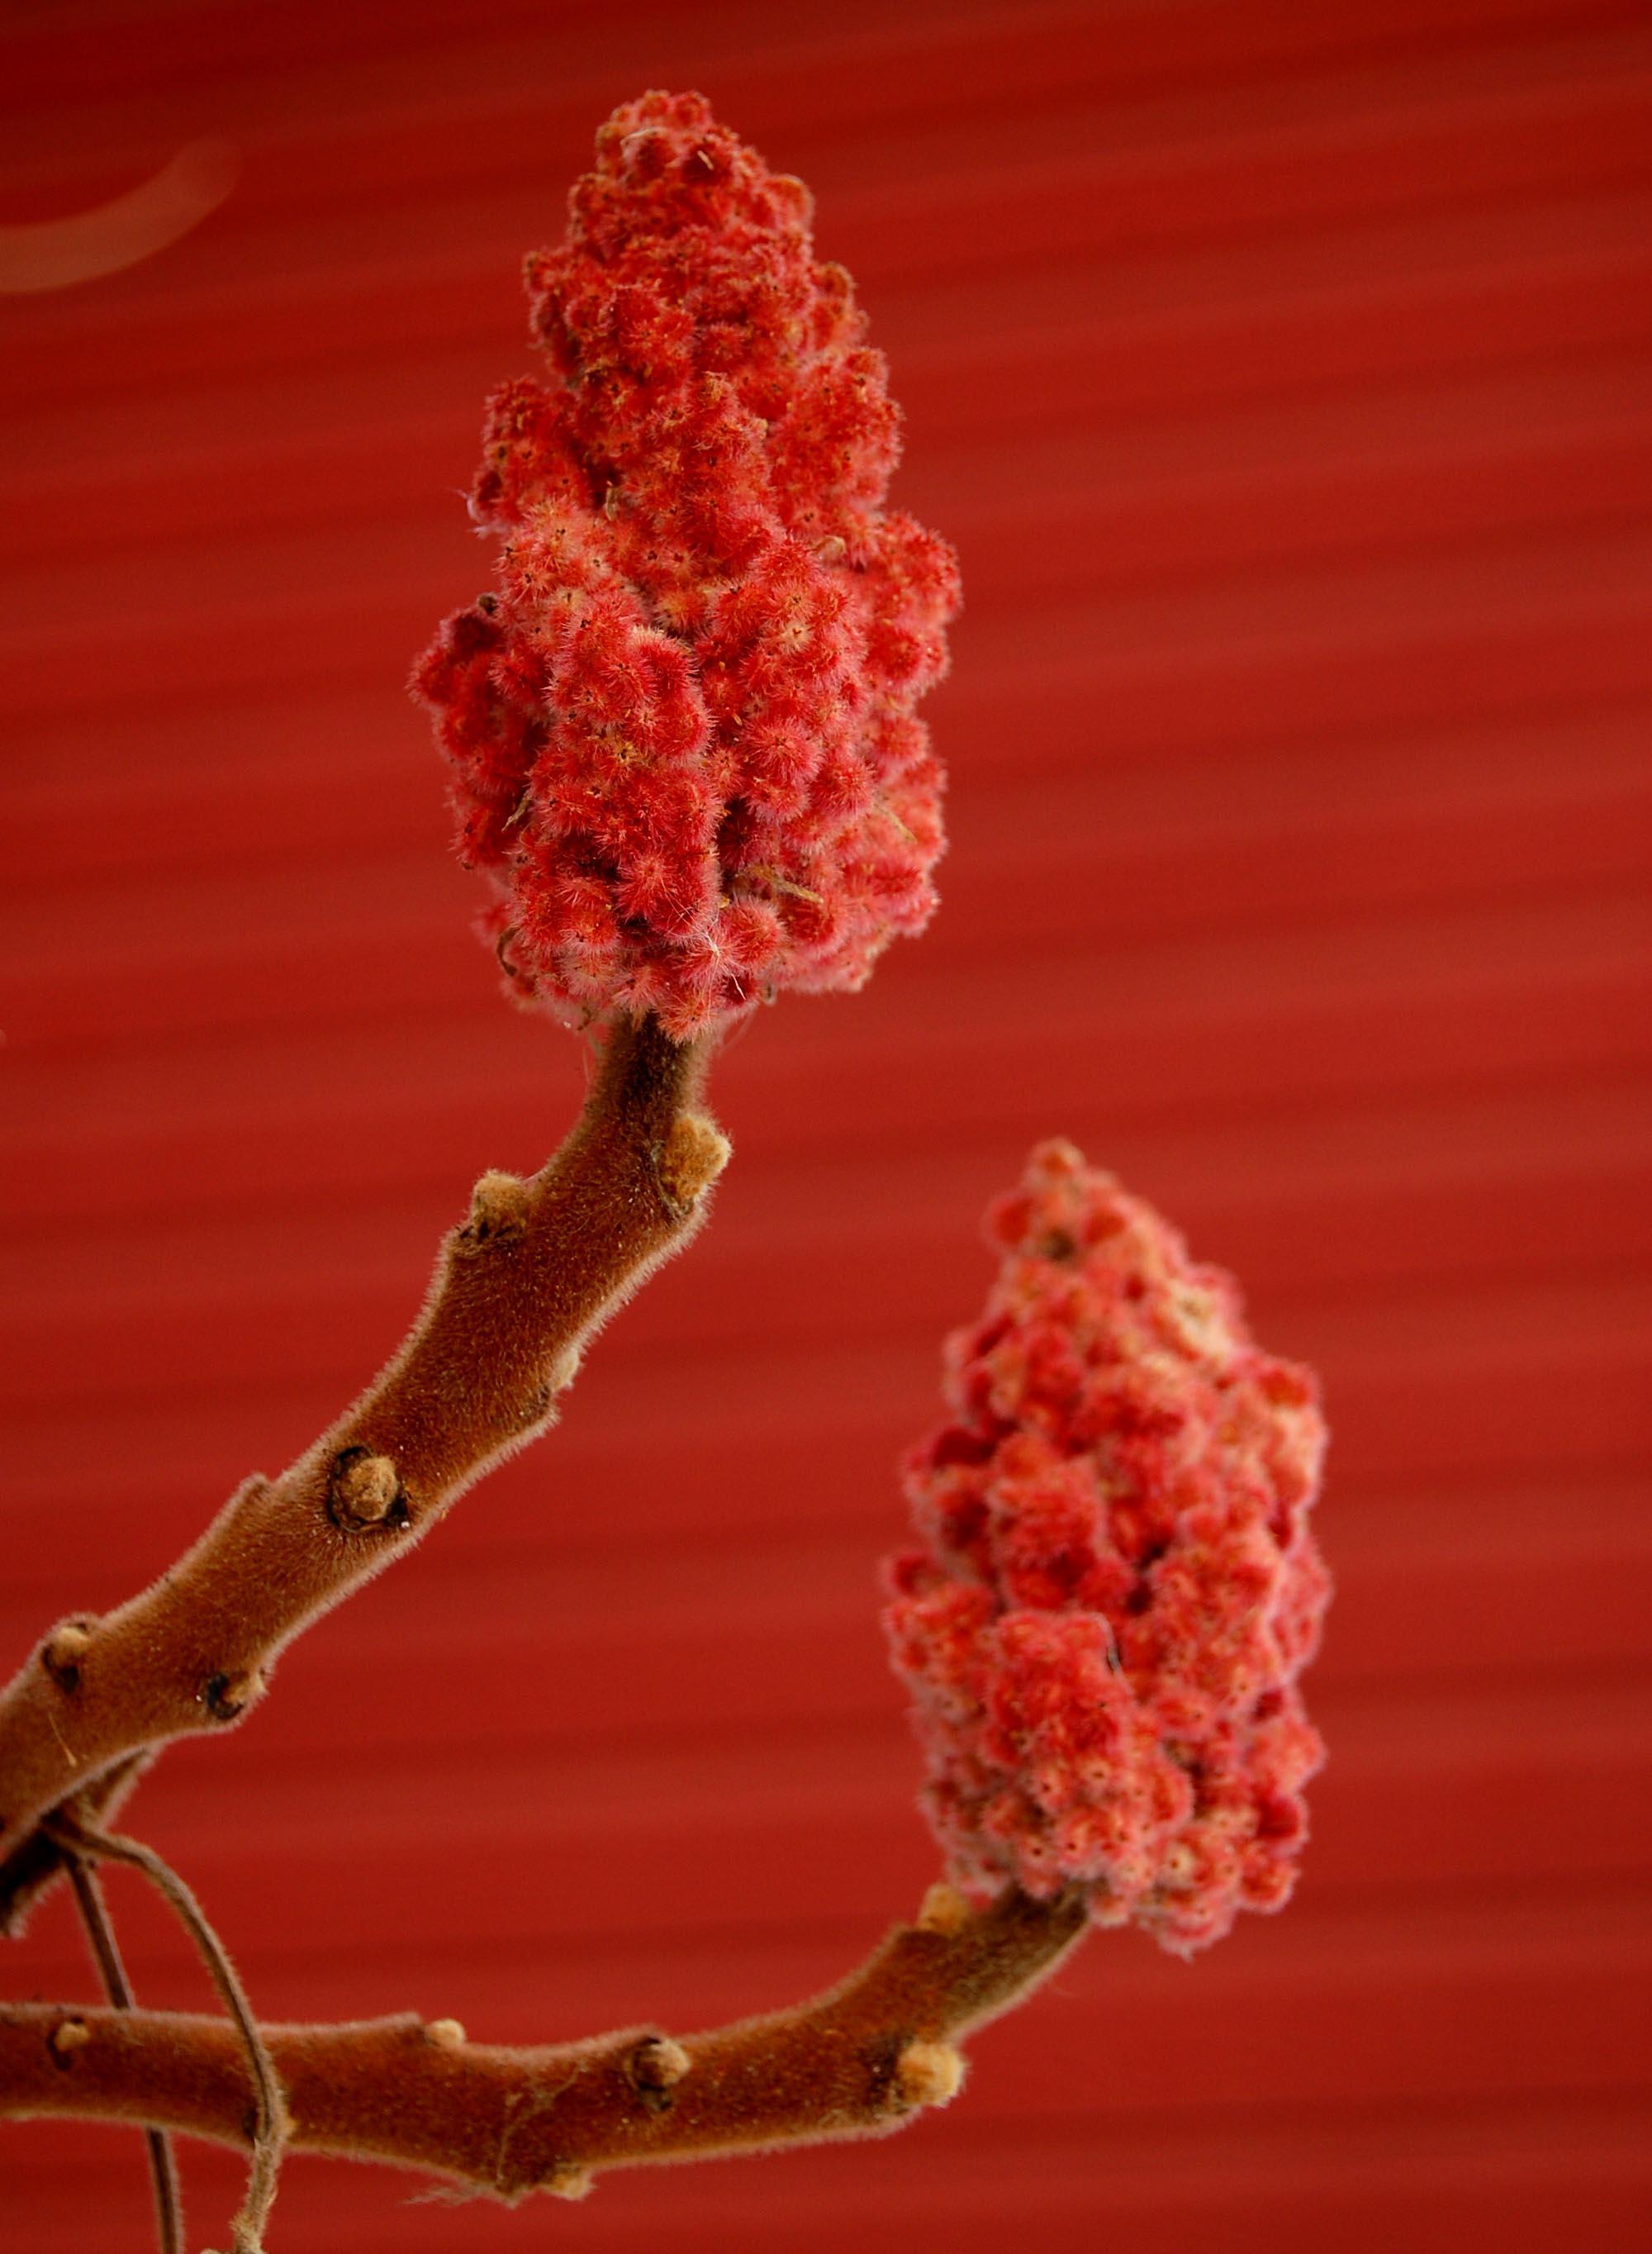 Red buds